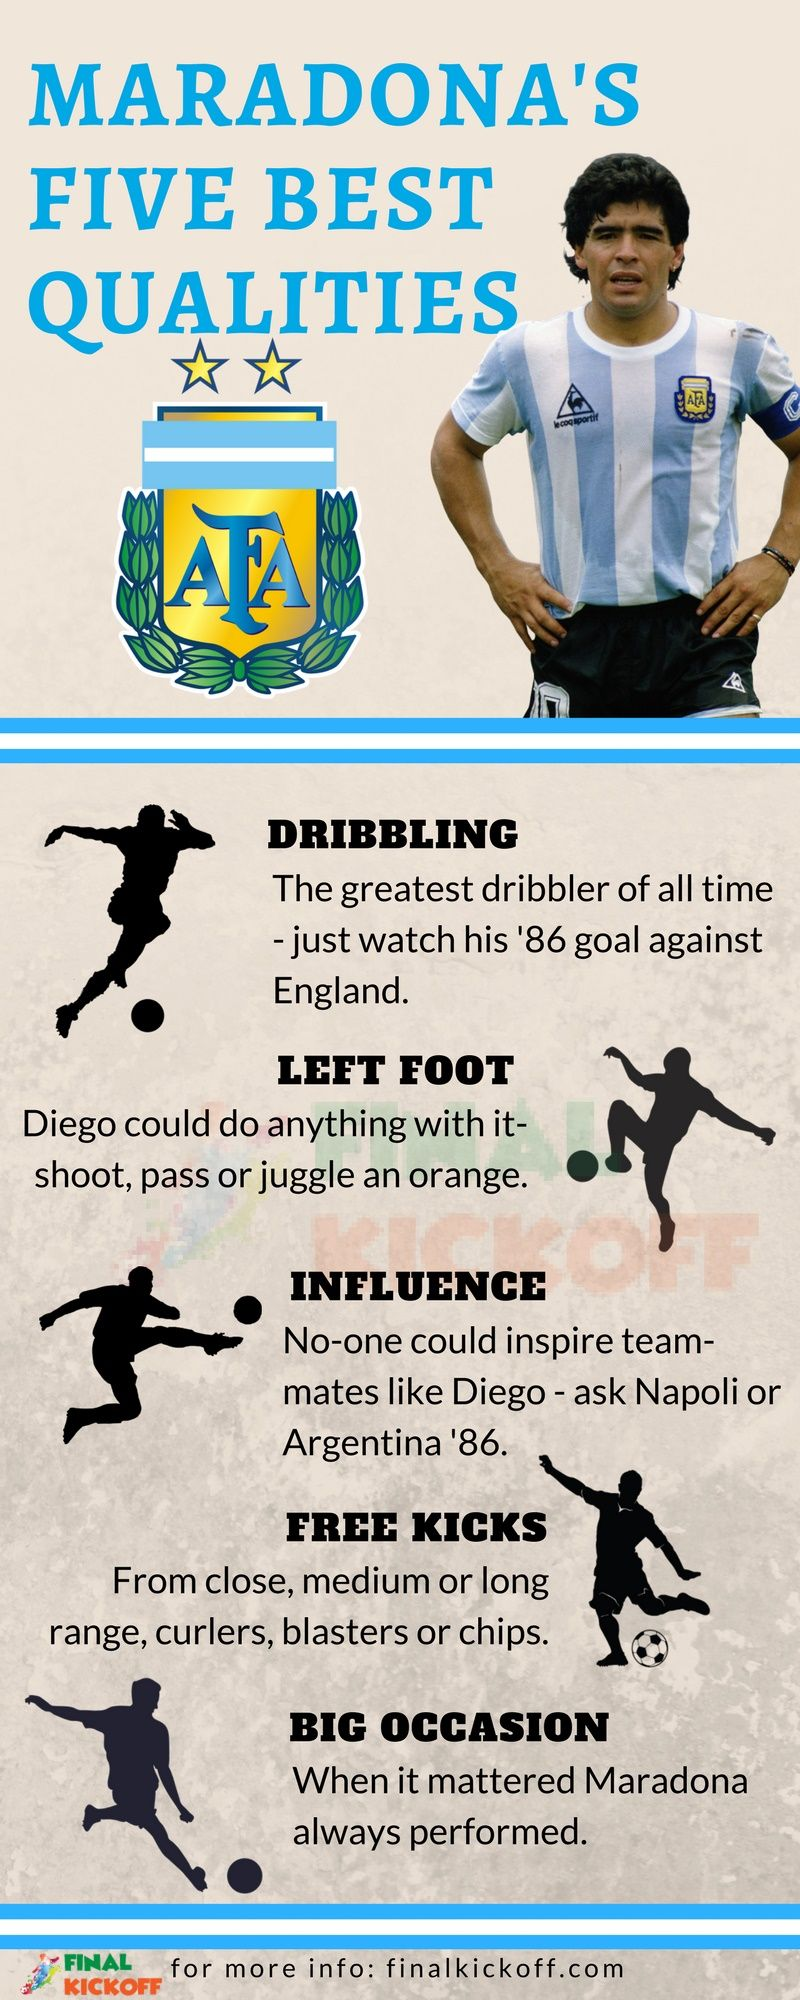 Maradona And Pele Five Best Qualities Fifa World Cup Fifa World Cup World Cup Pele